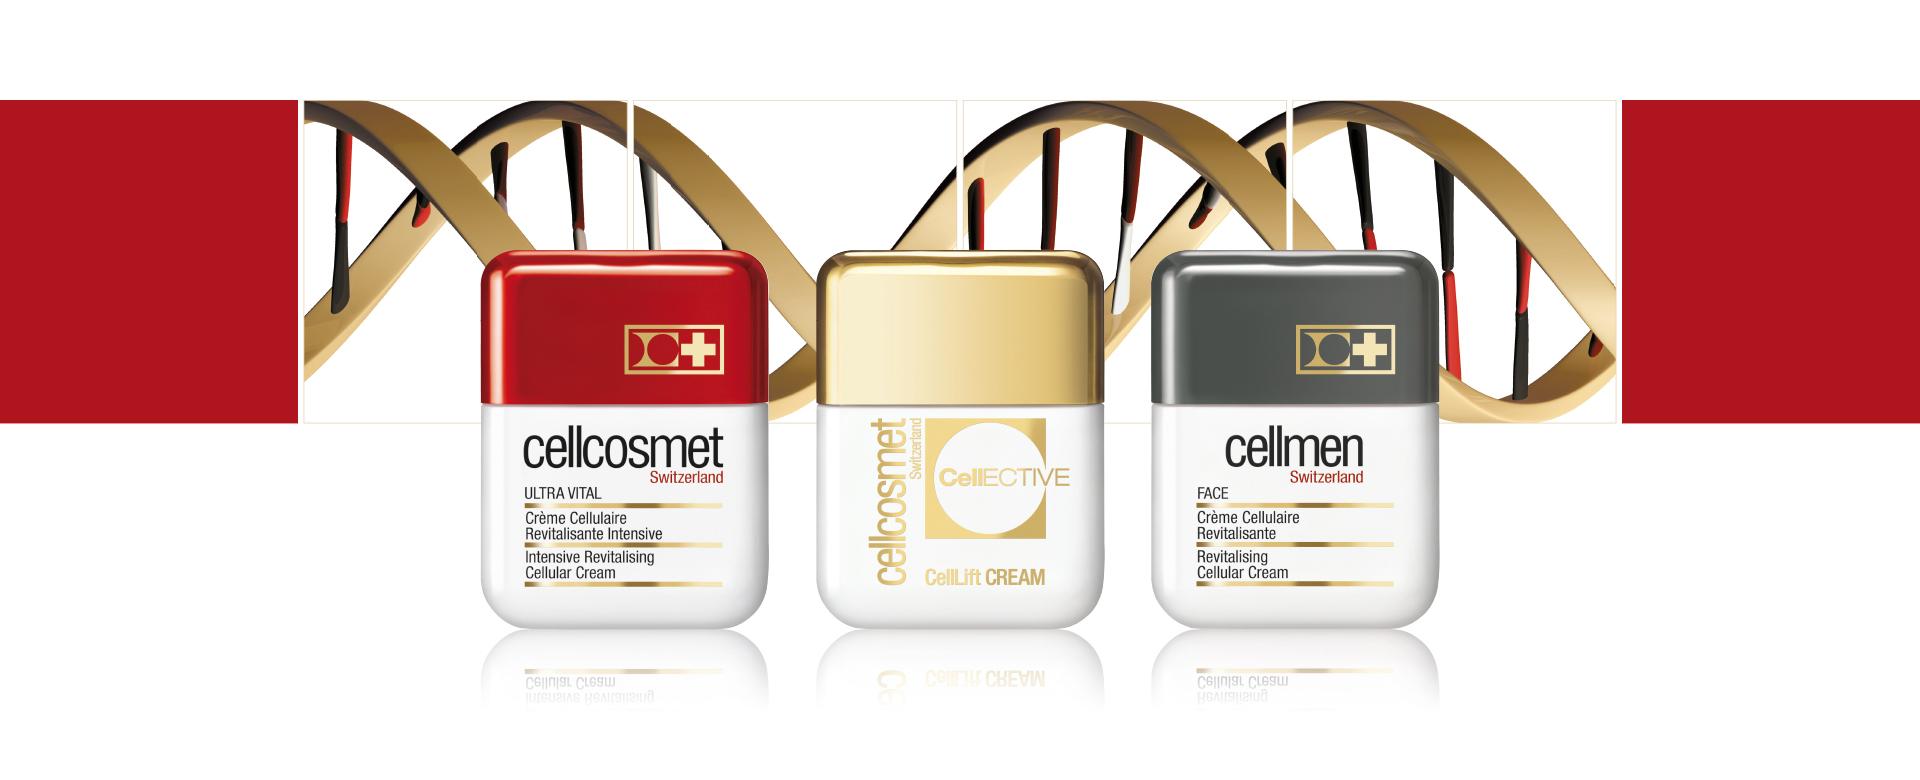 Cellcosmet Switzerland